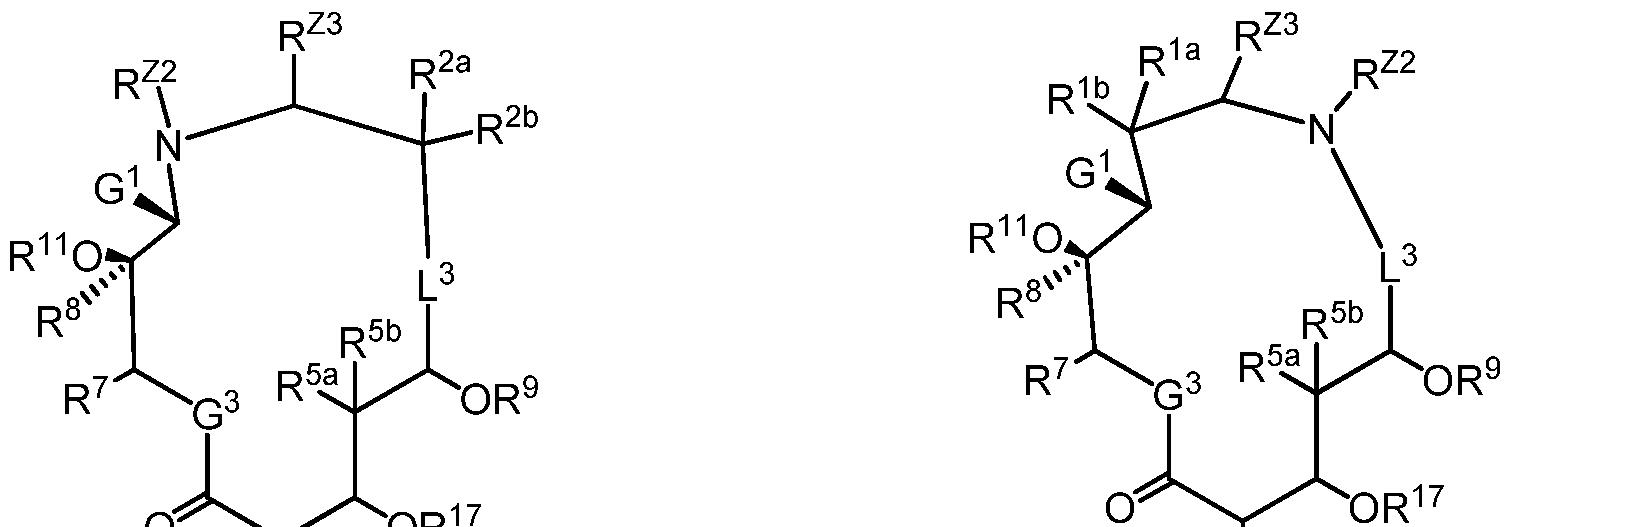 hight resolution of figure imgf000058 0001